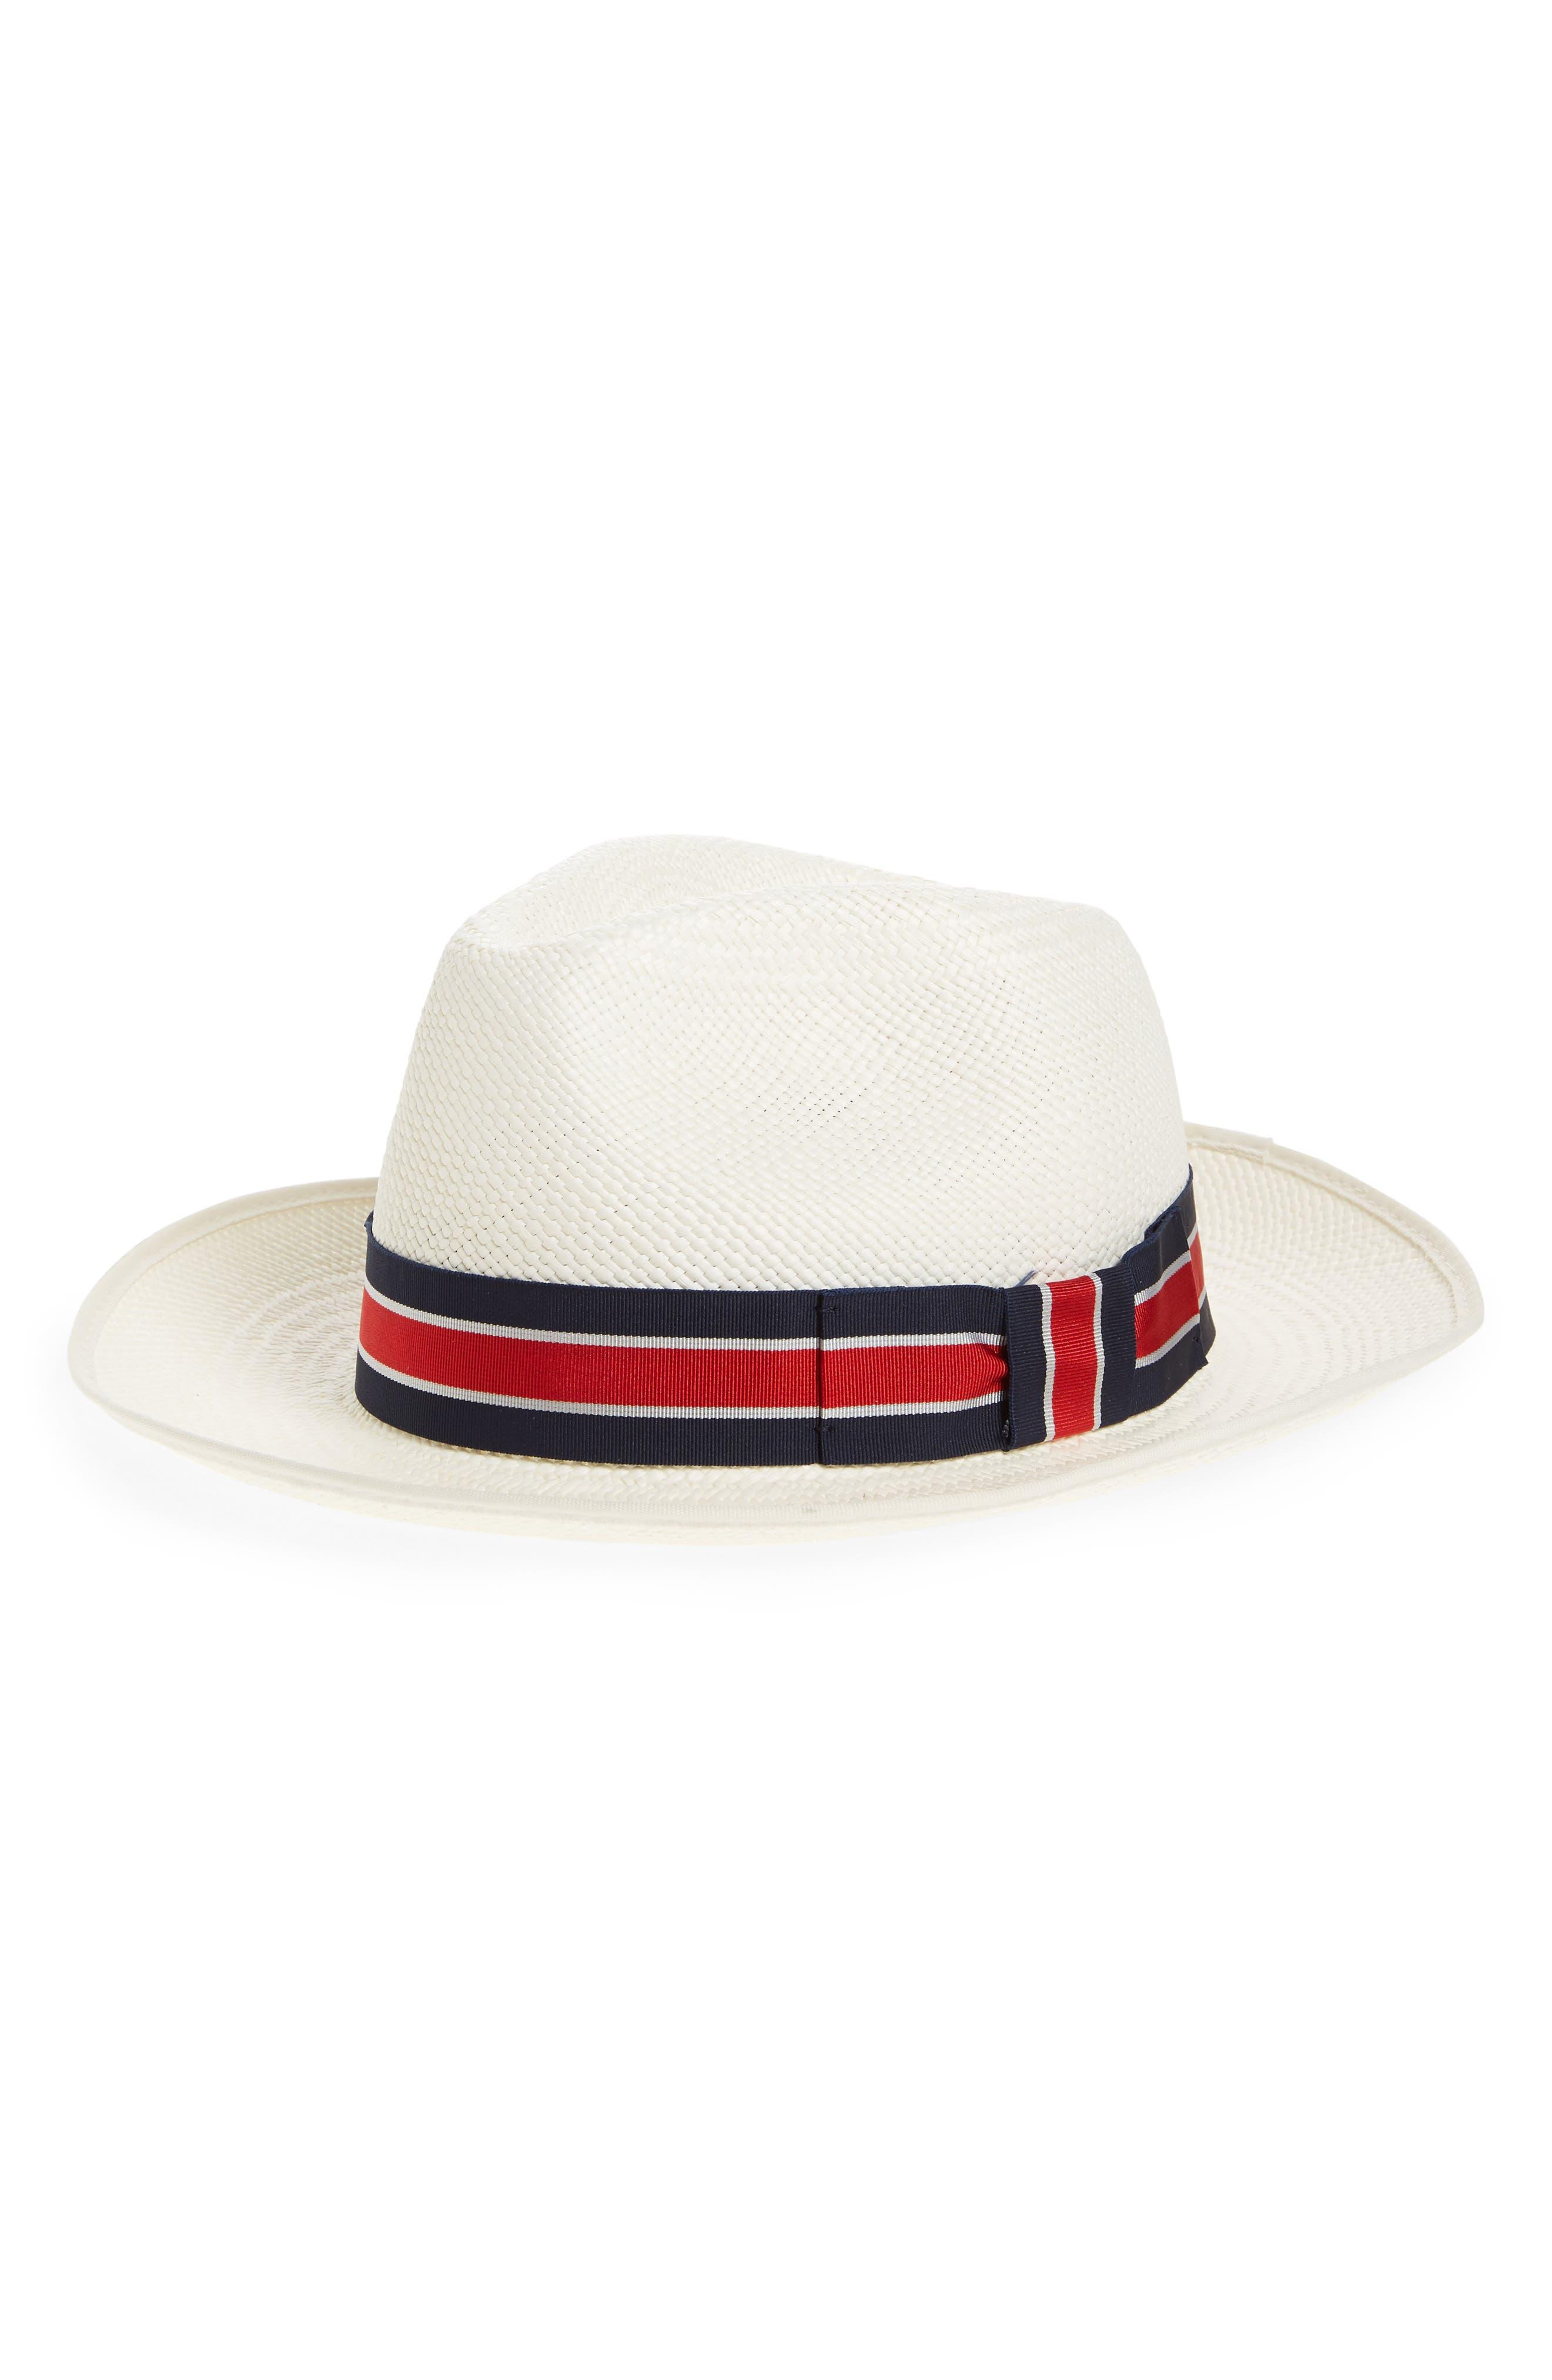 Christy's Preset Panama Hat,                         Main,                         color,